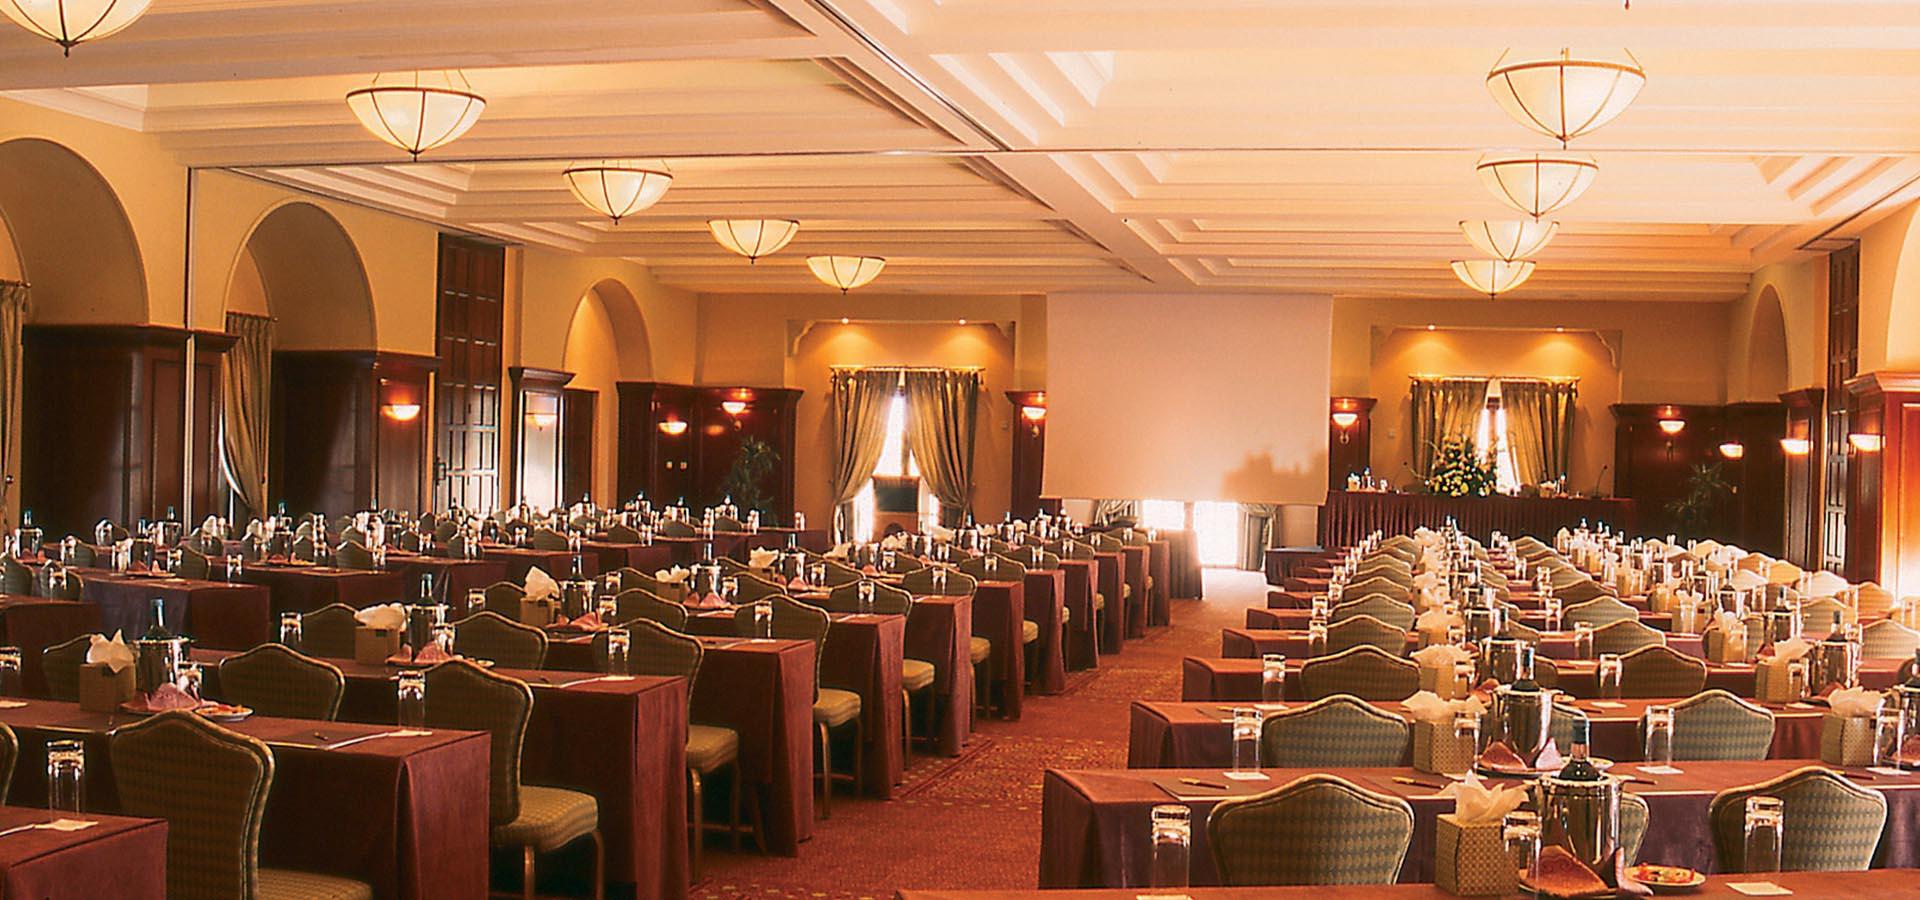 Basilica Foyer Elysium Hotel : Large banquet halls paphos elysium hotel